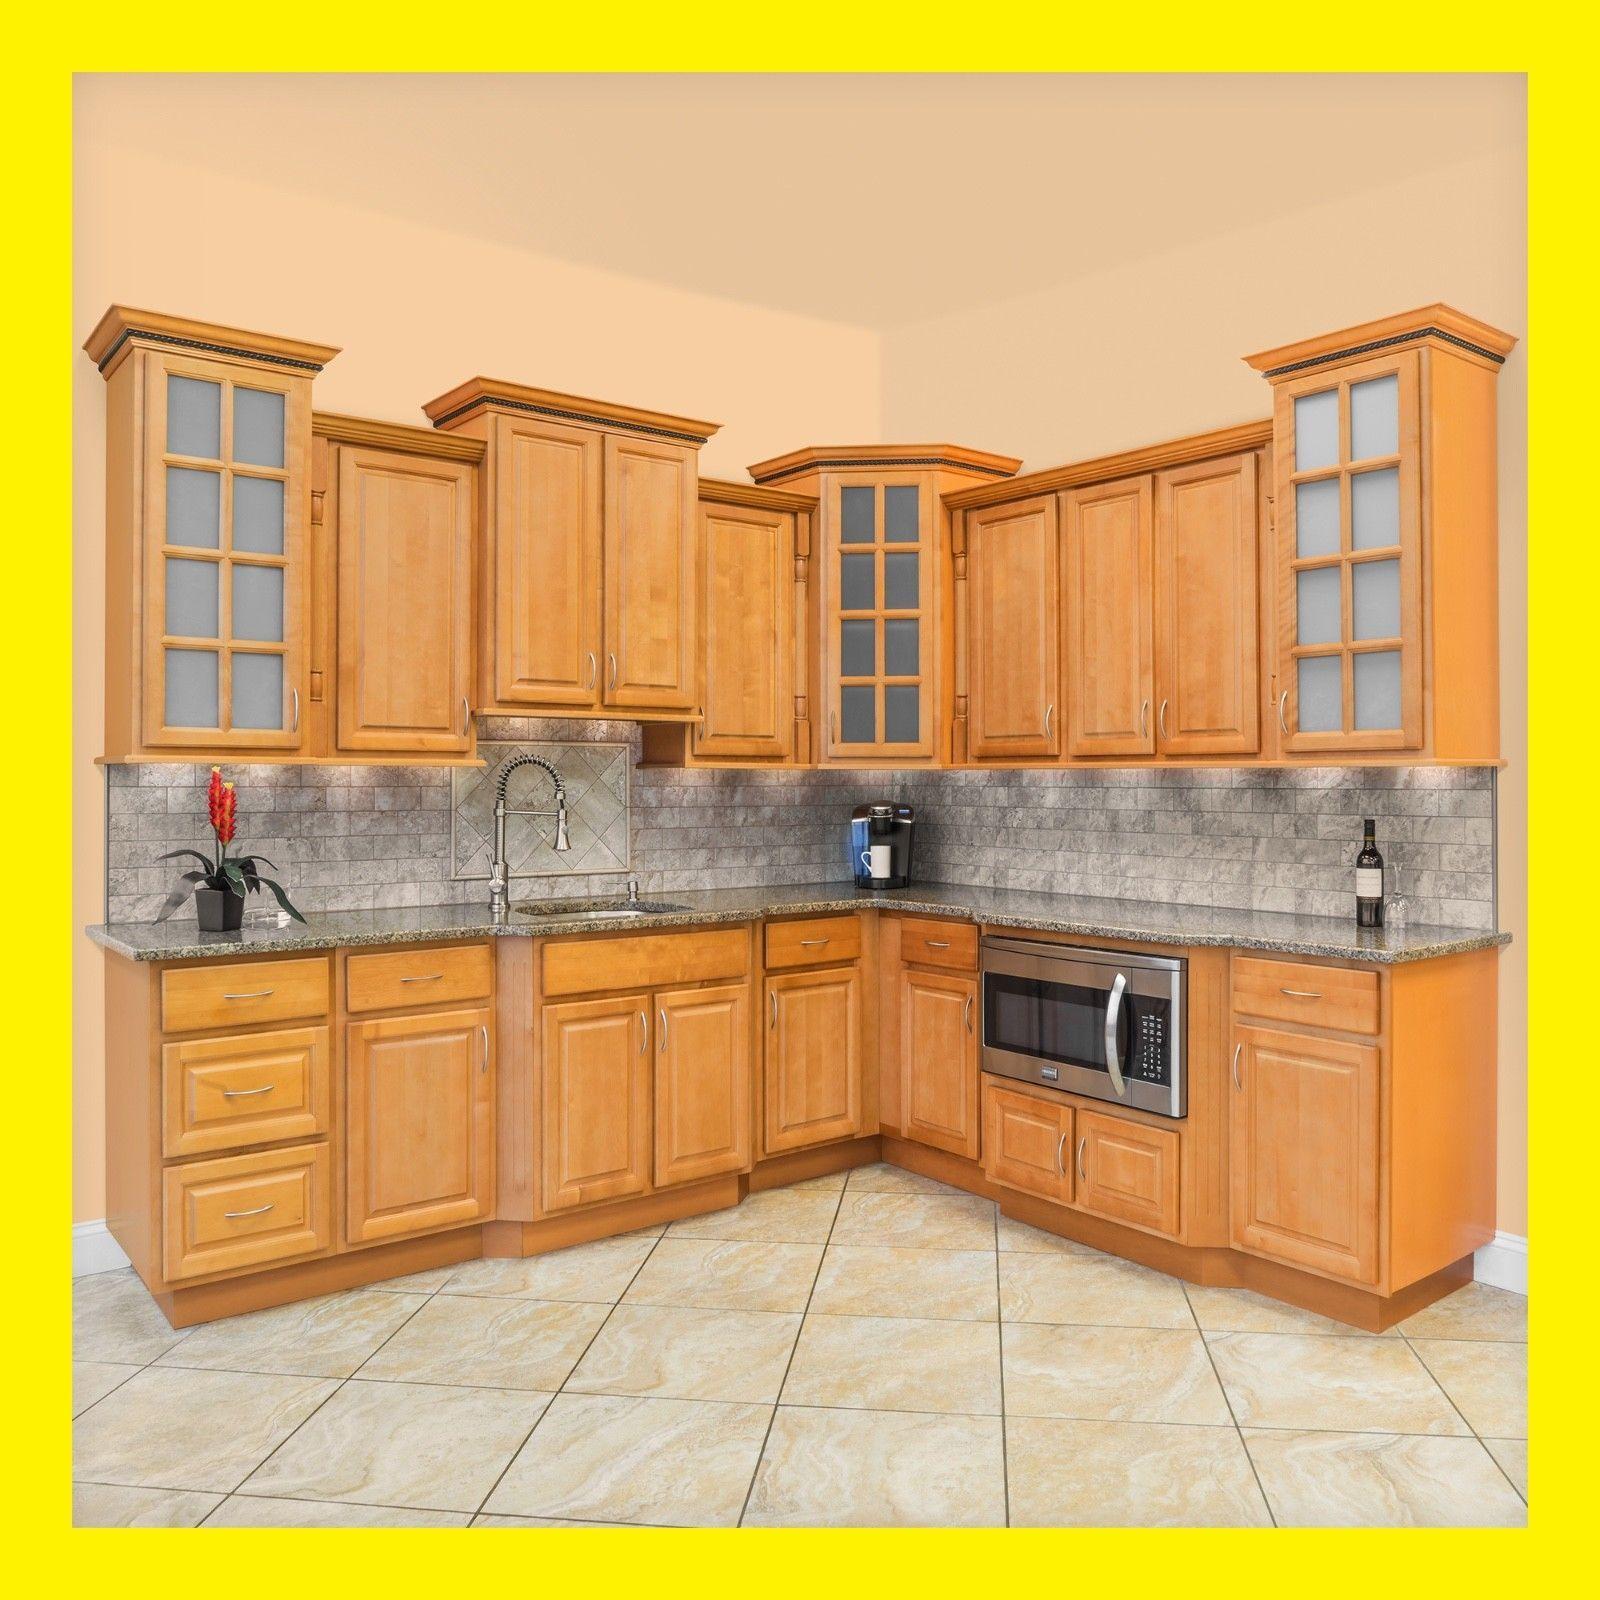 Https Ift Tt 2jw1lsv Kitchen Cabinets Ideas Of Kitchen Cabinets Kitchen Cabinets Cheap Kitchen Cabinets Kitchen Cabinets For Sale Solid Wood Kitchens